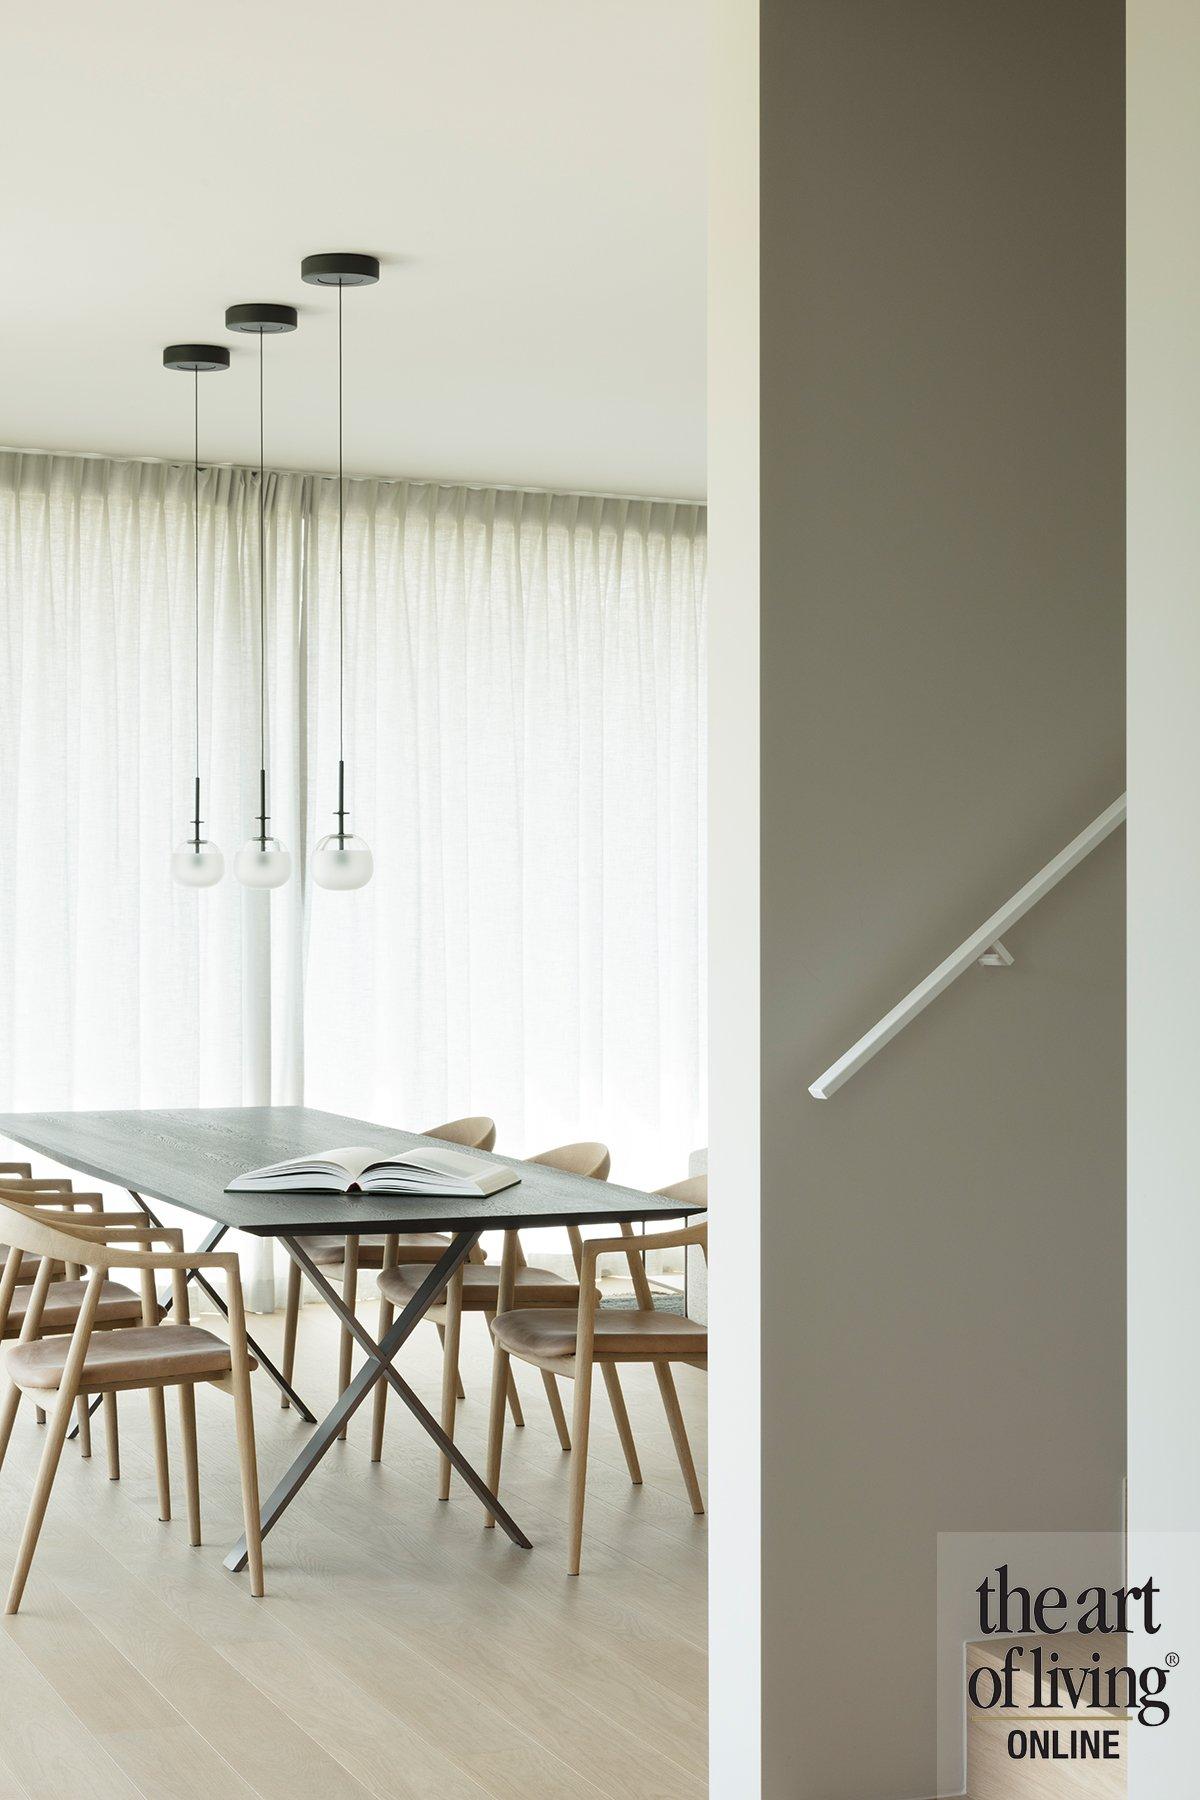 Licht interieur | Niko Wauters, the art of living